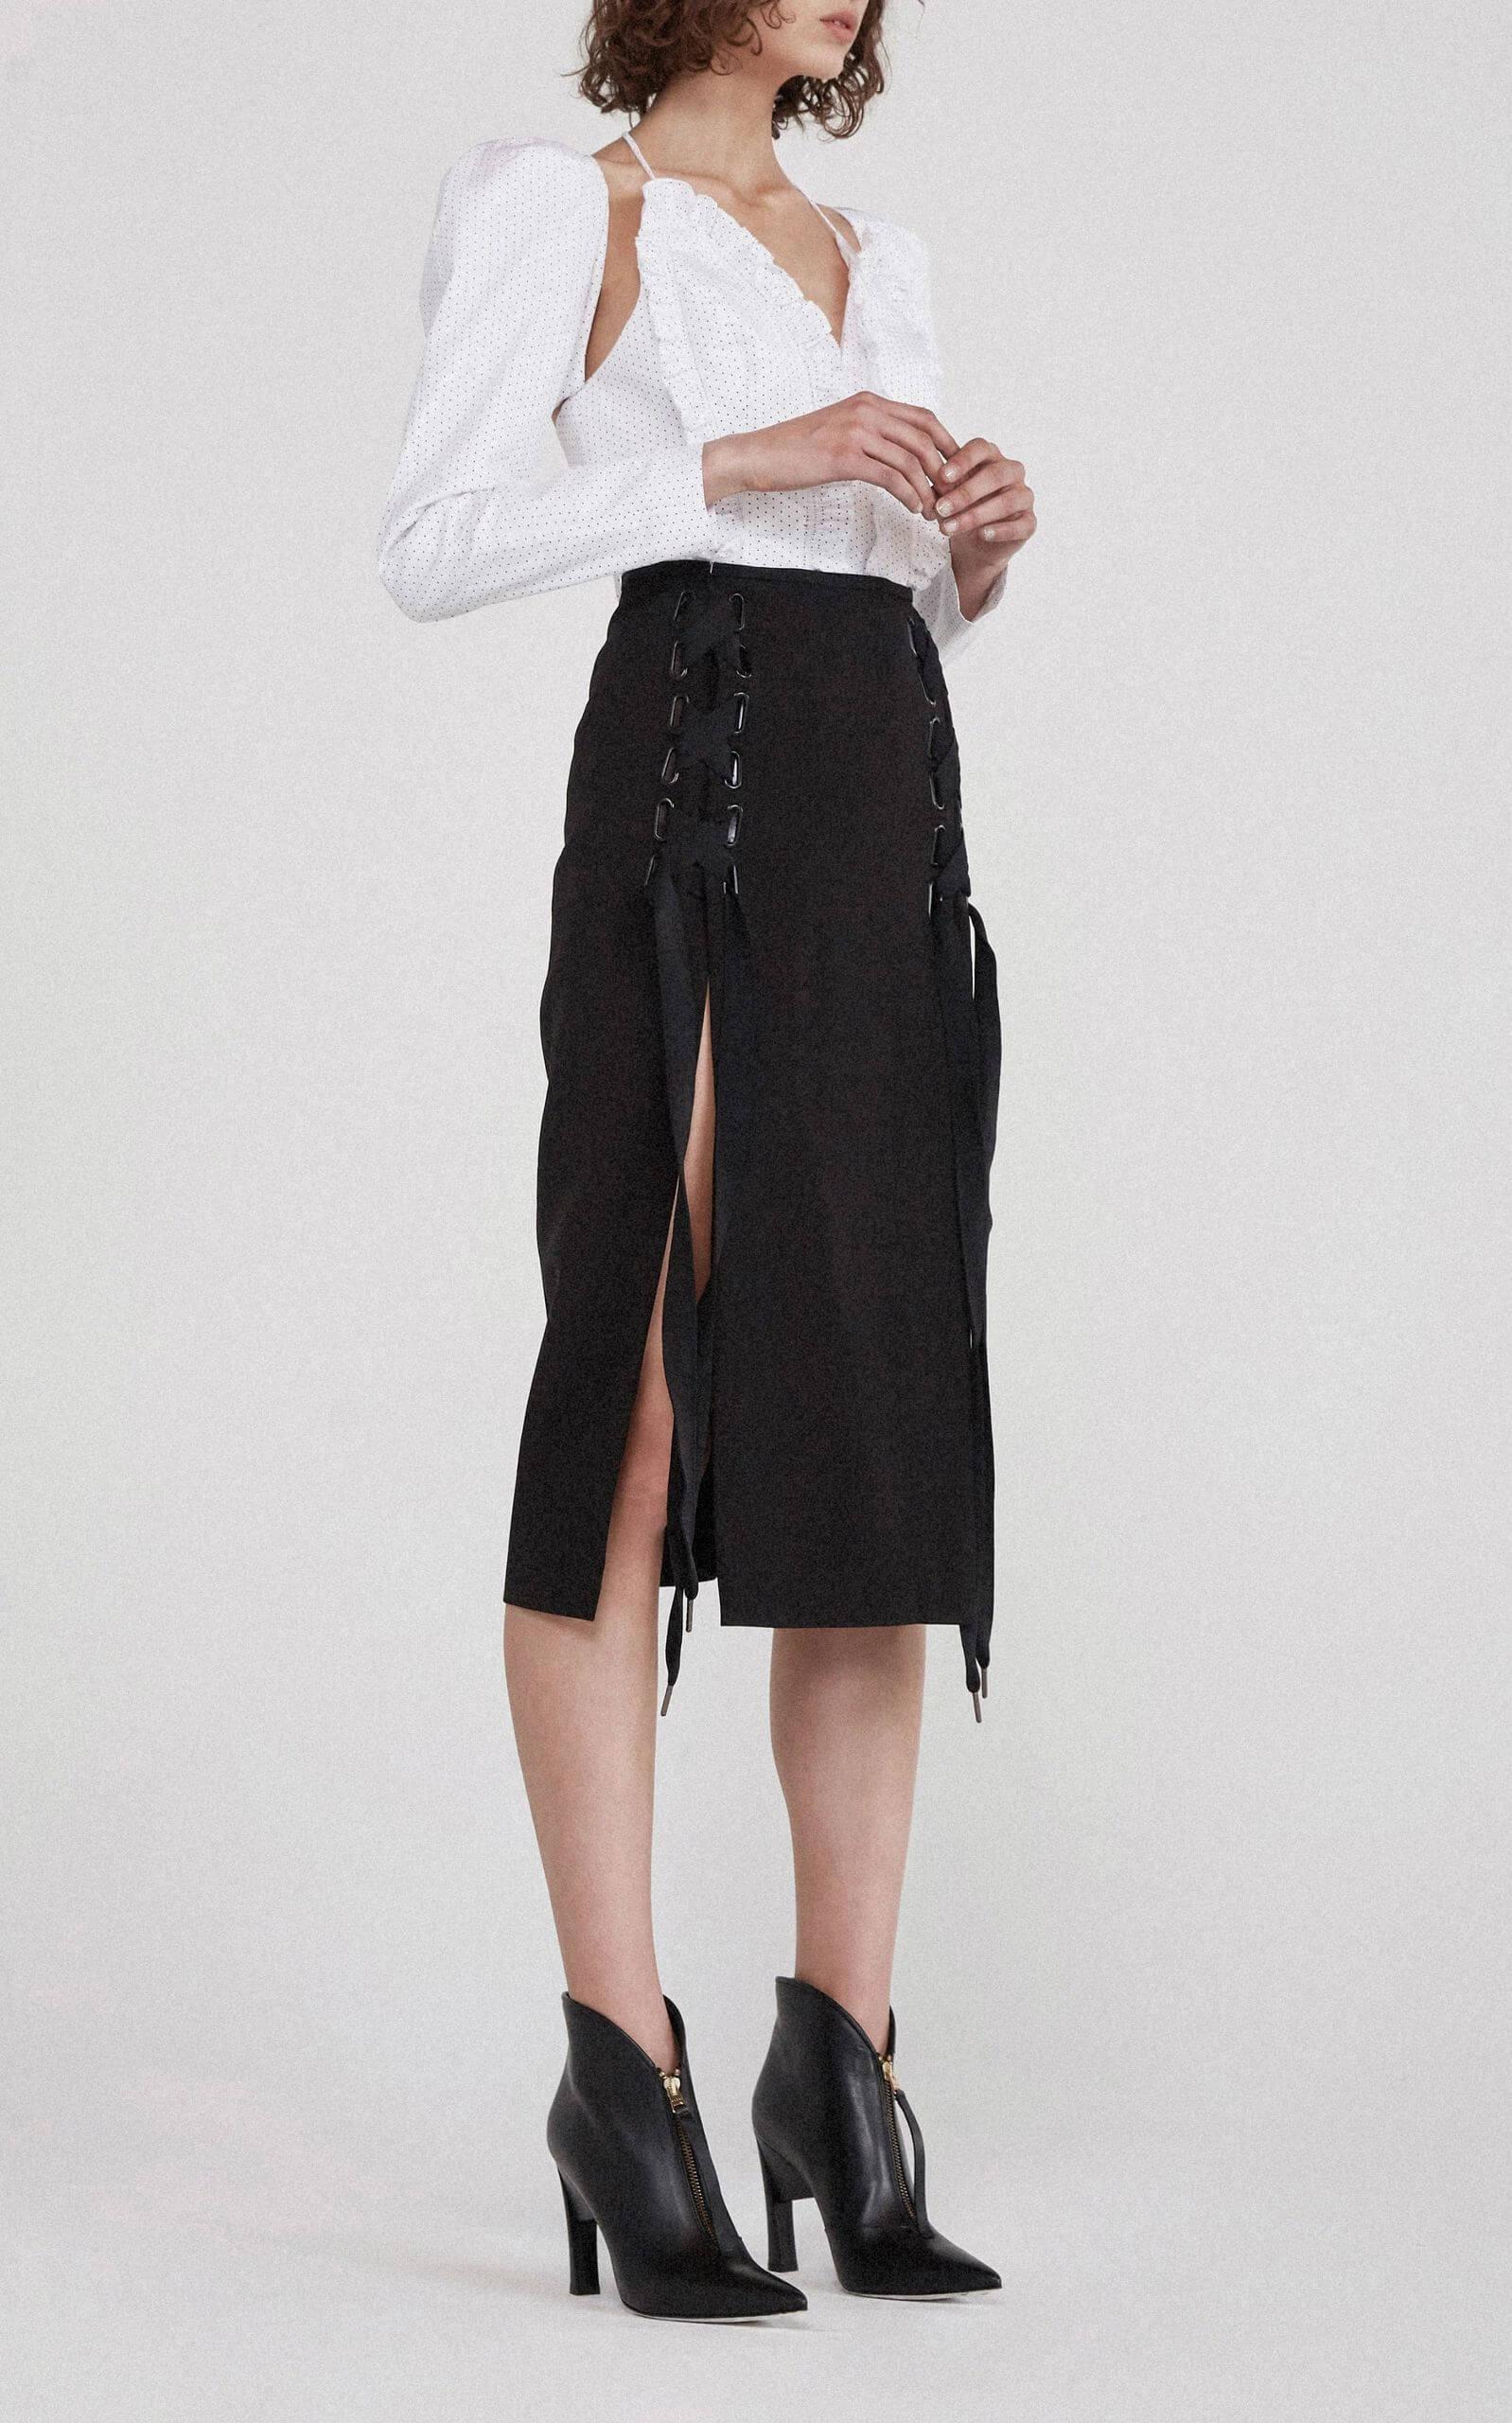 Harwich Skirt